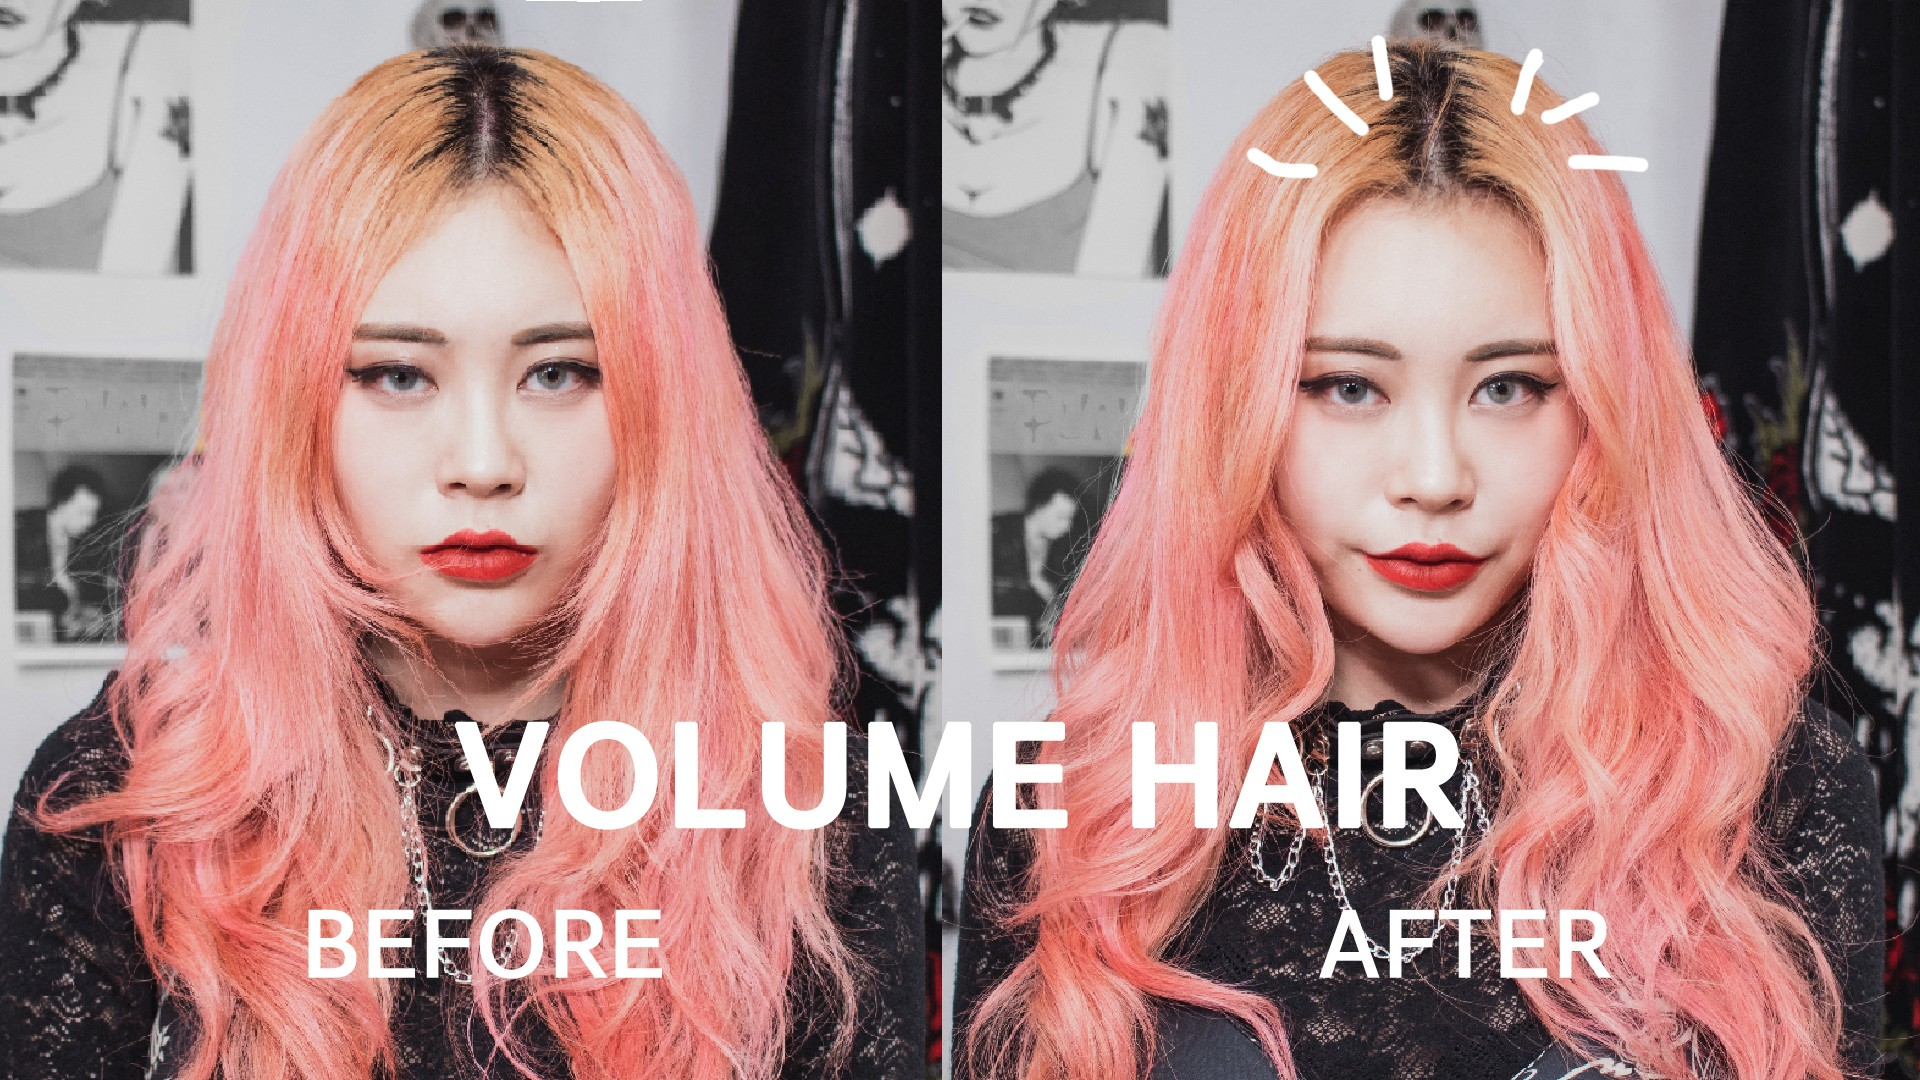 EUNBI✟How to get Kpop Idol volume hairstyle 아이돌처럼 앞머리 볼륨 만드는 방법